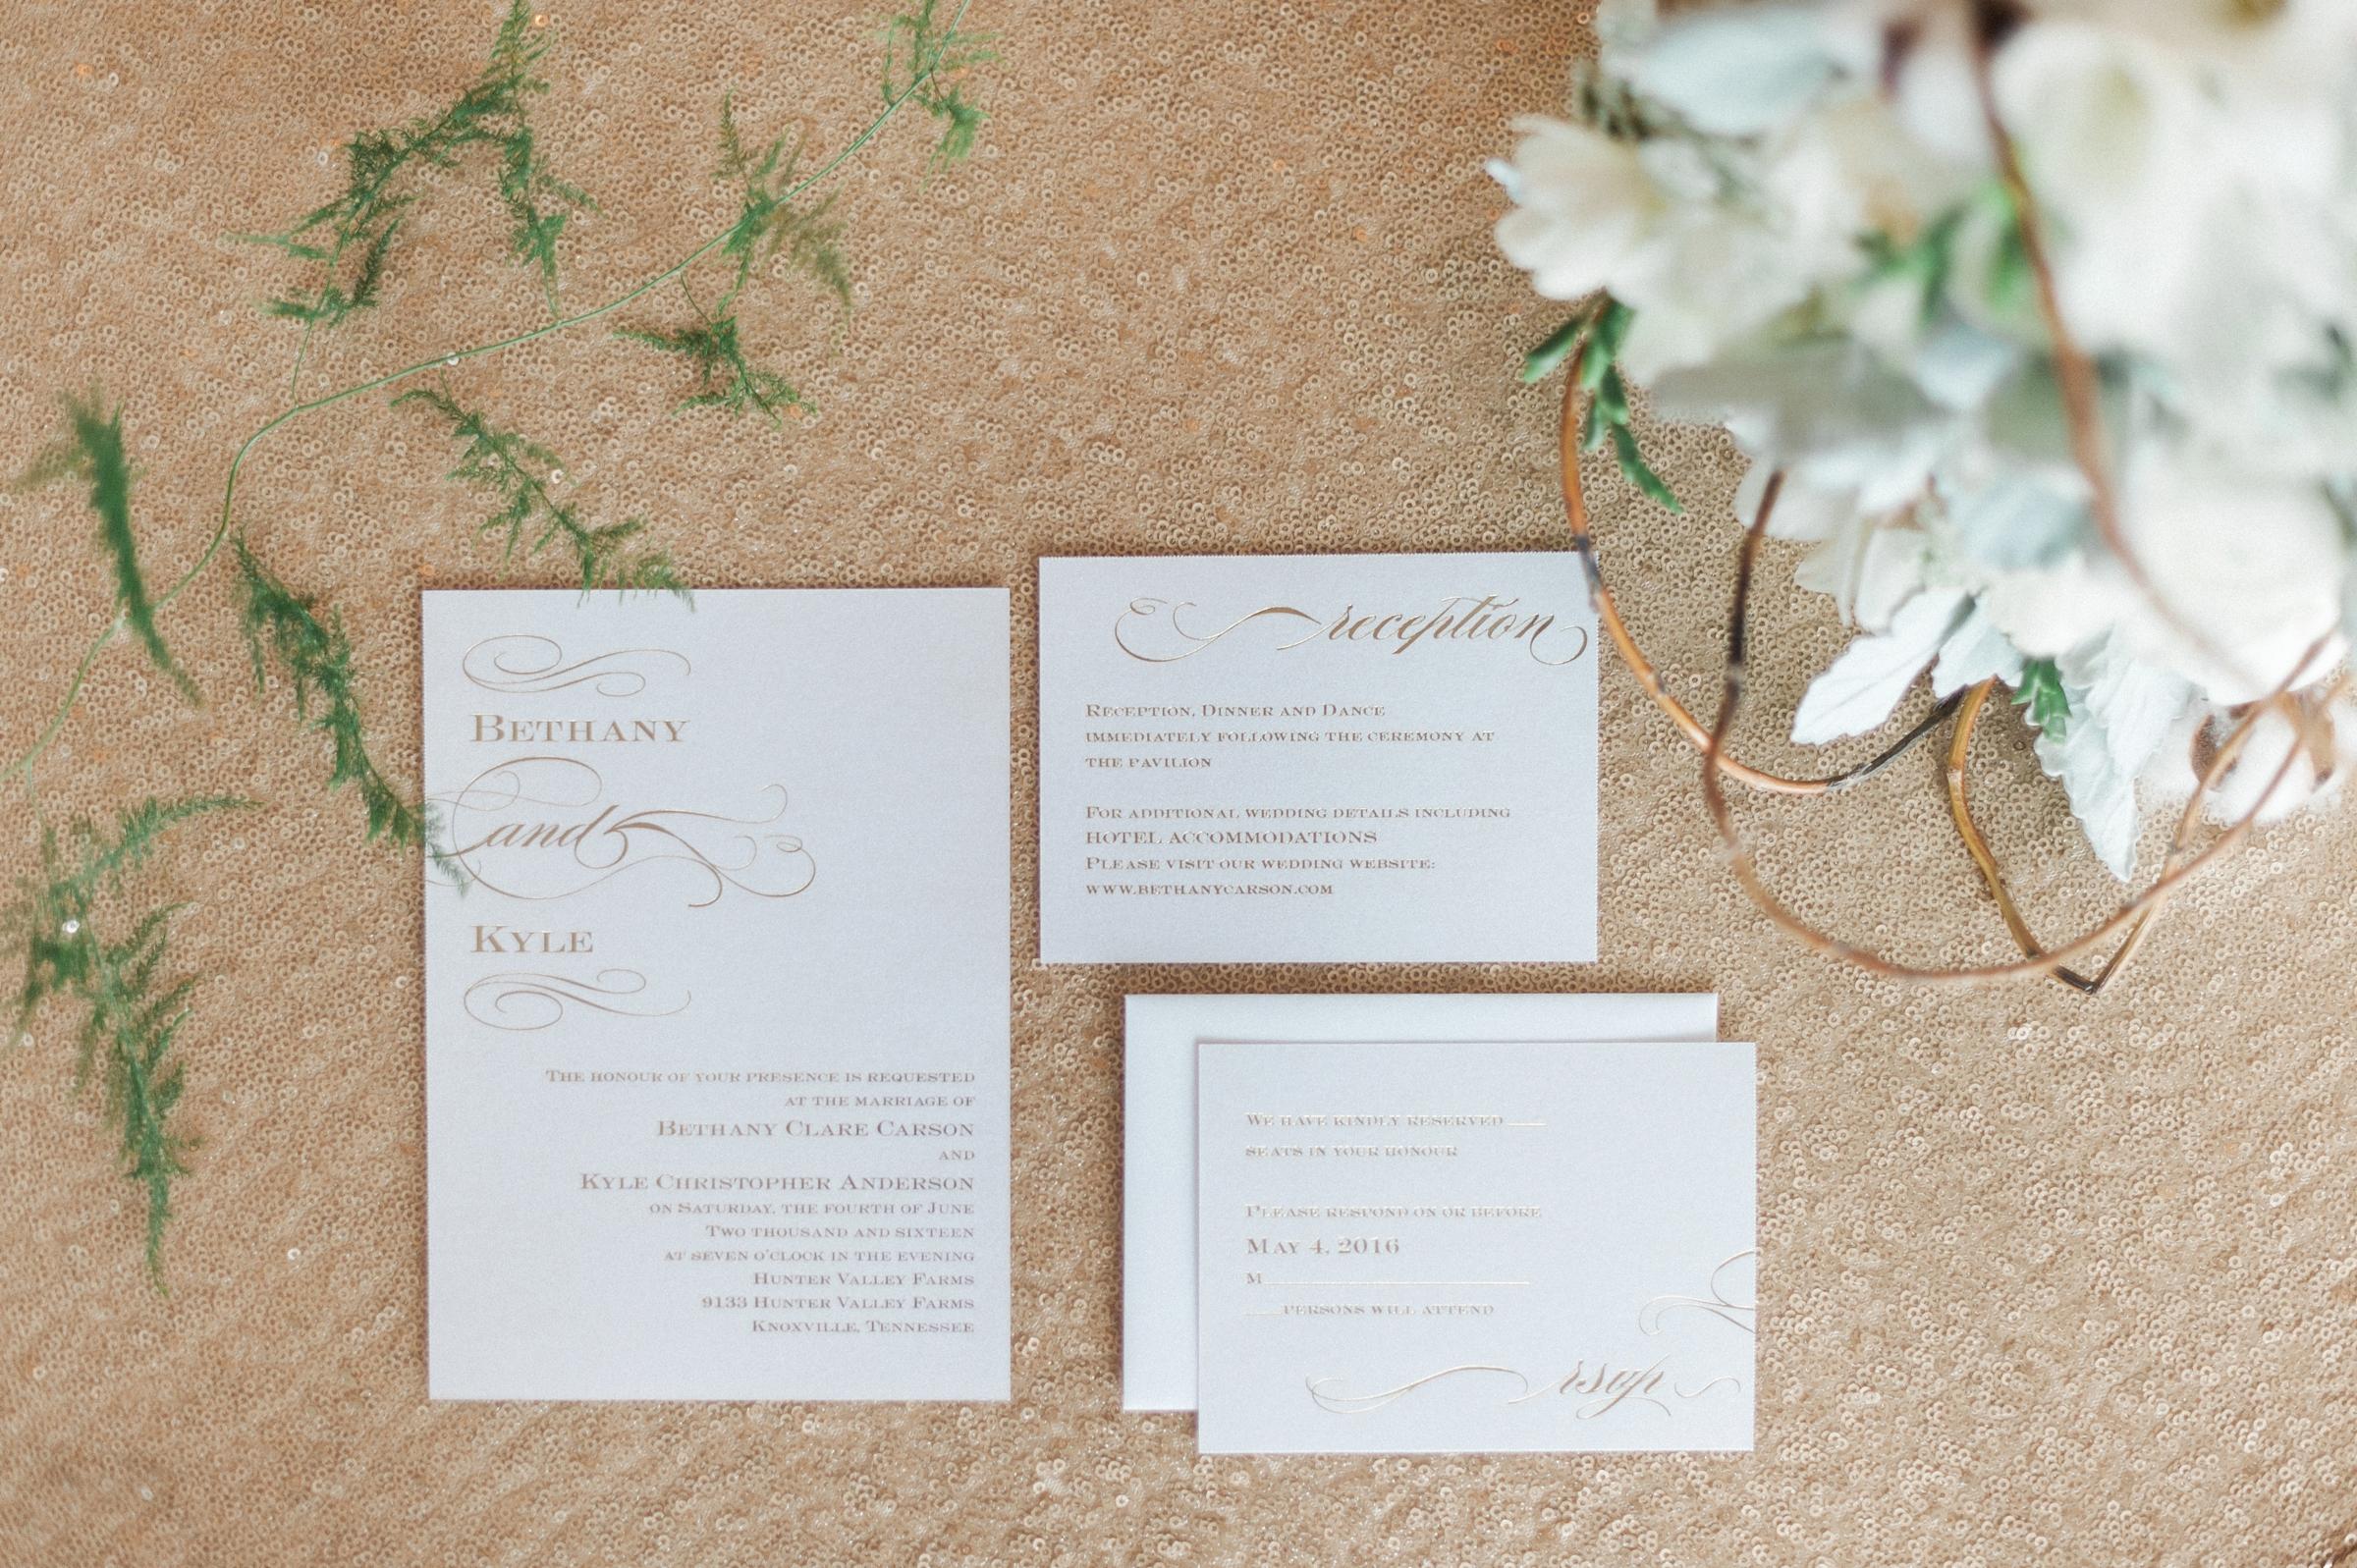 Knoxville-Wedding-Photographer_0003.jpg